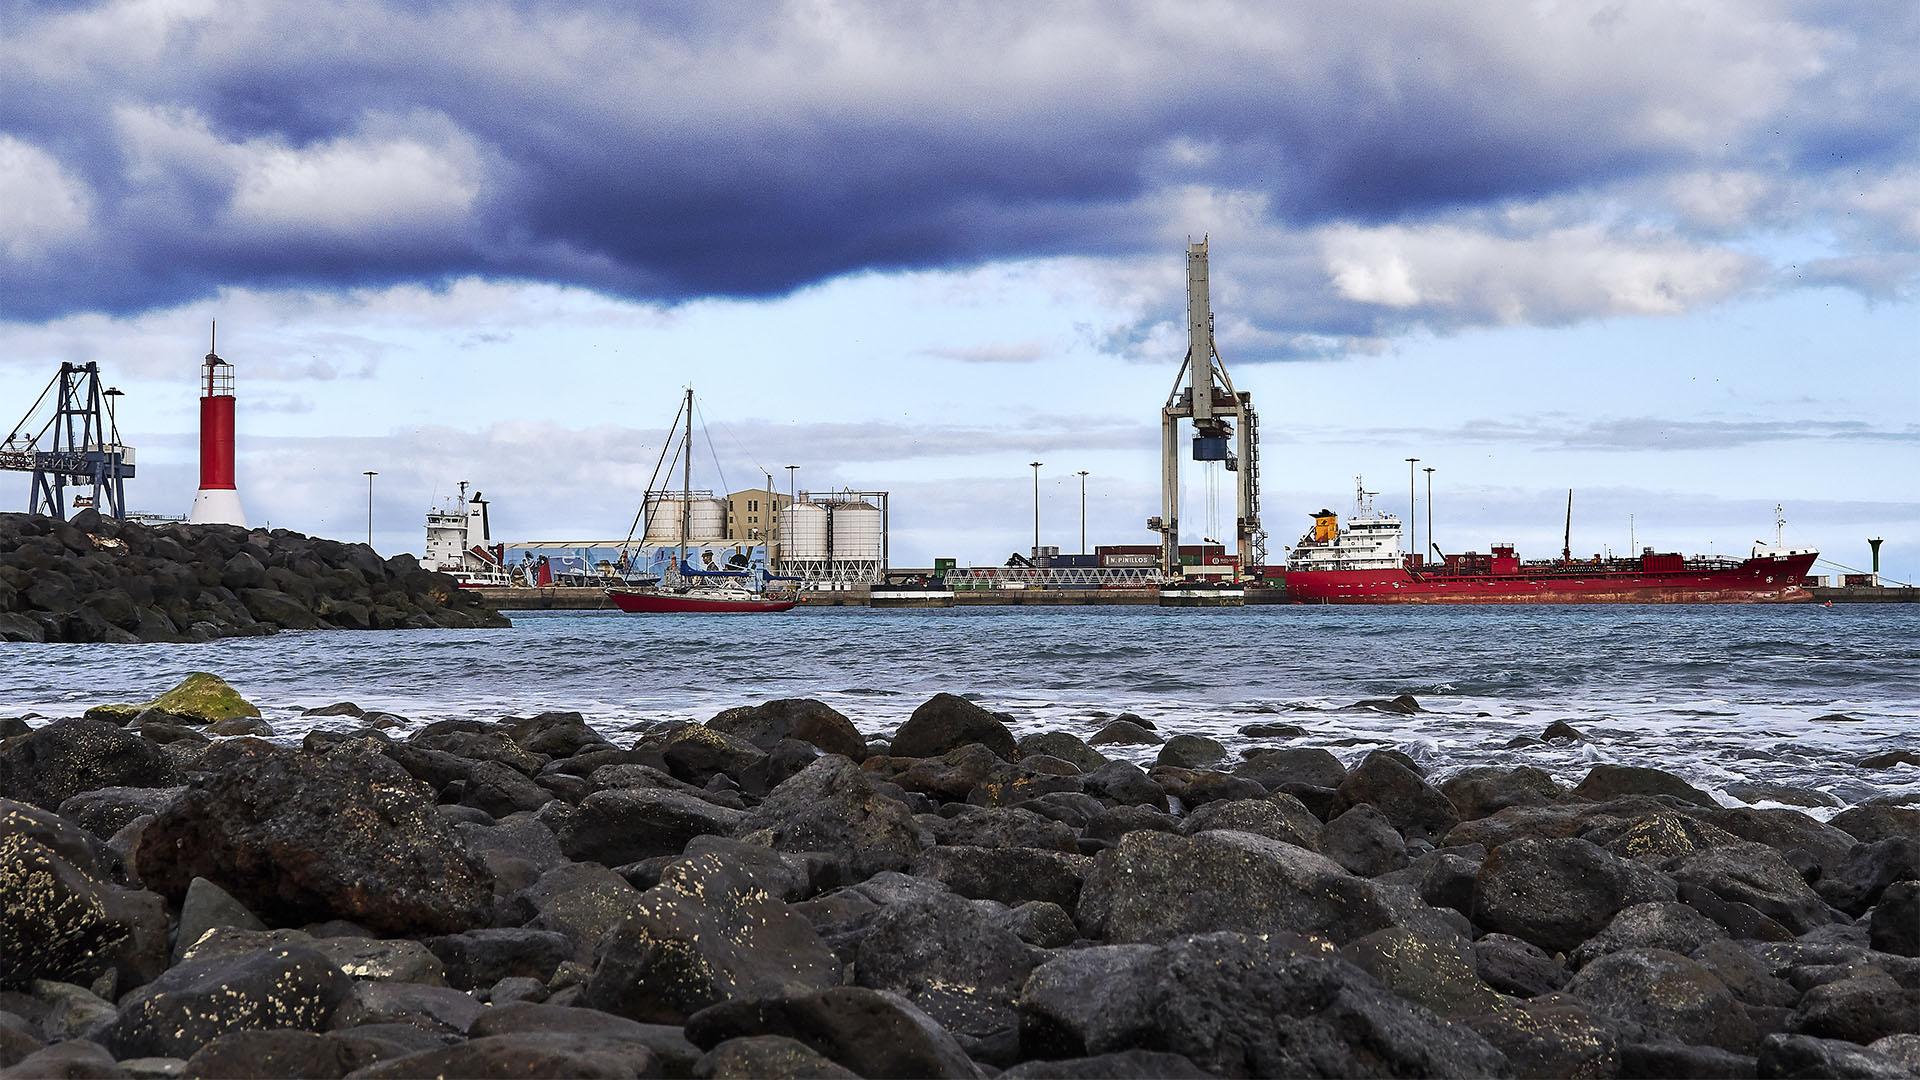 Der Hafen von Puerto del Rosario Fuerteventura.